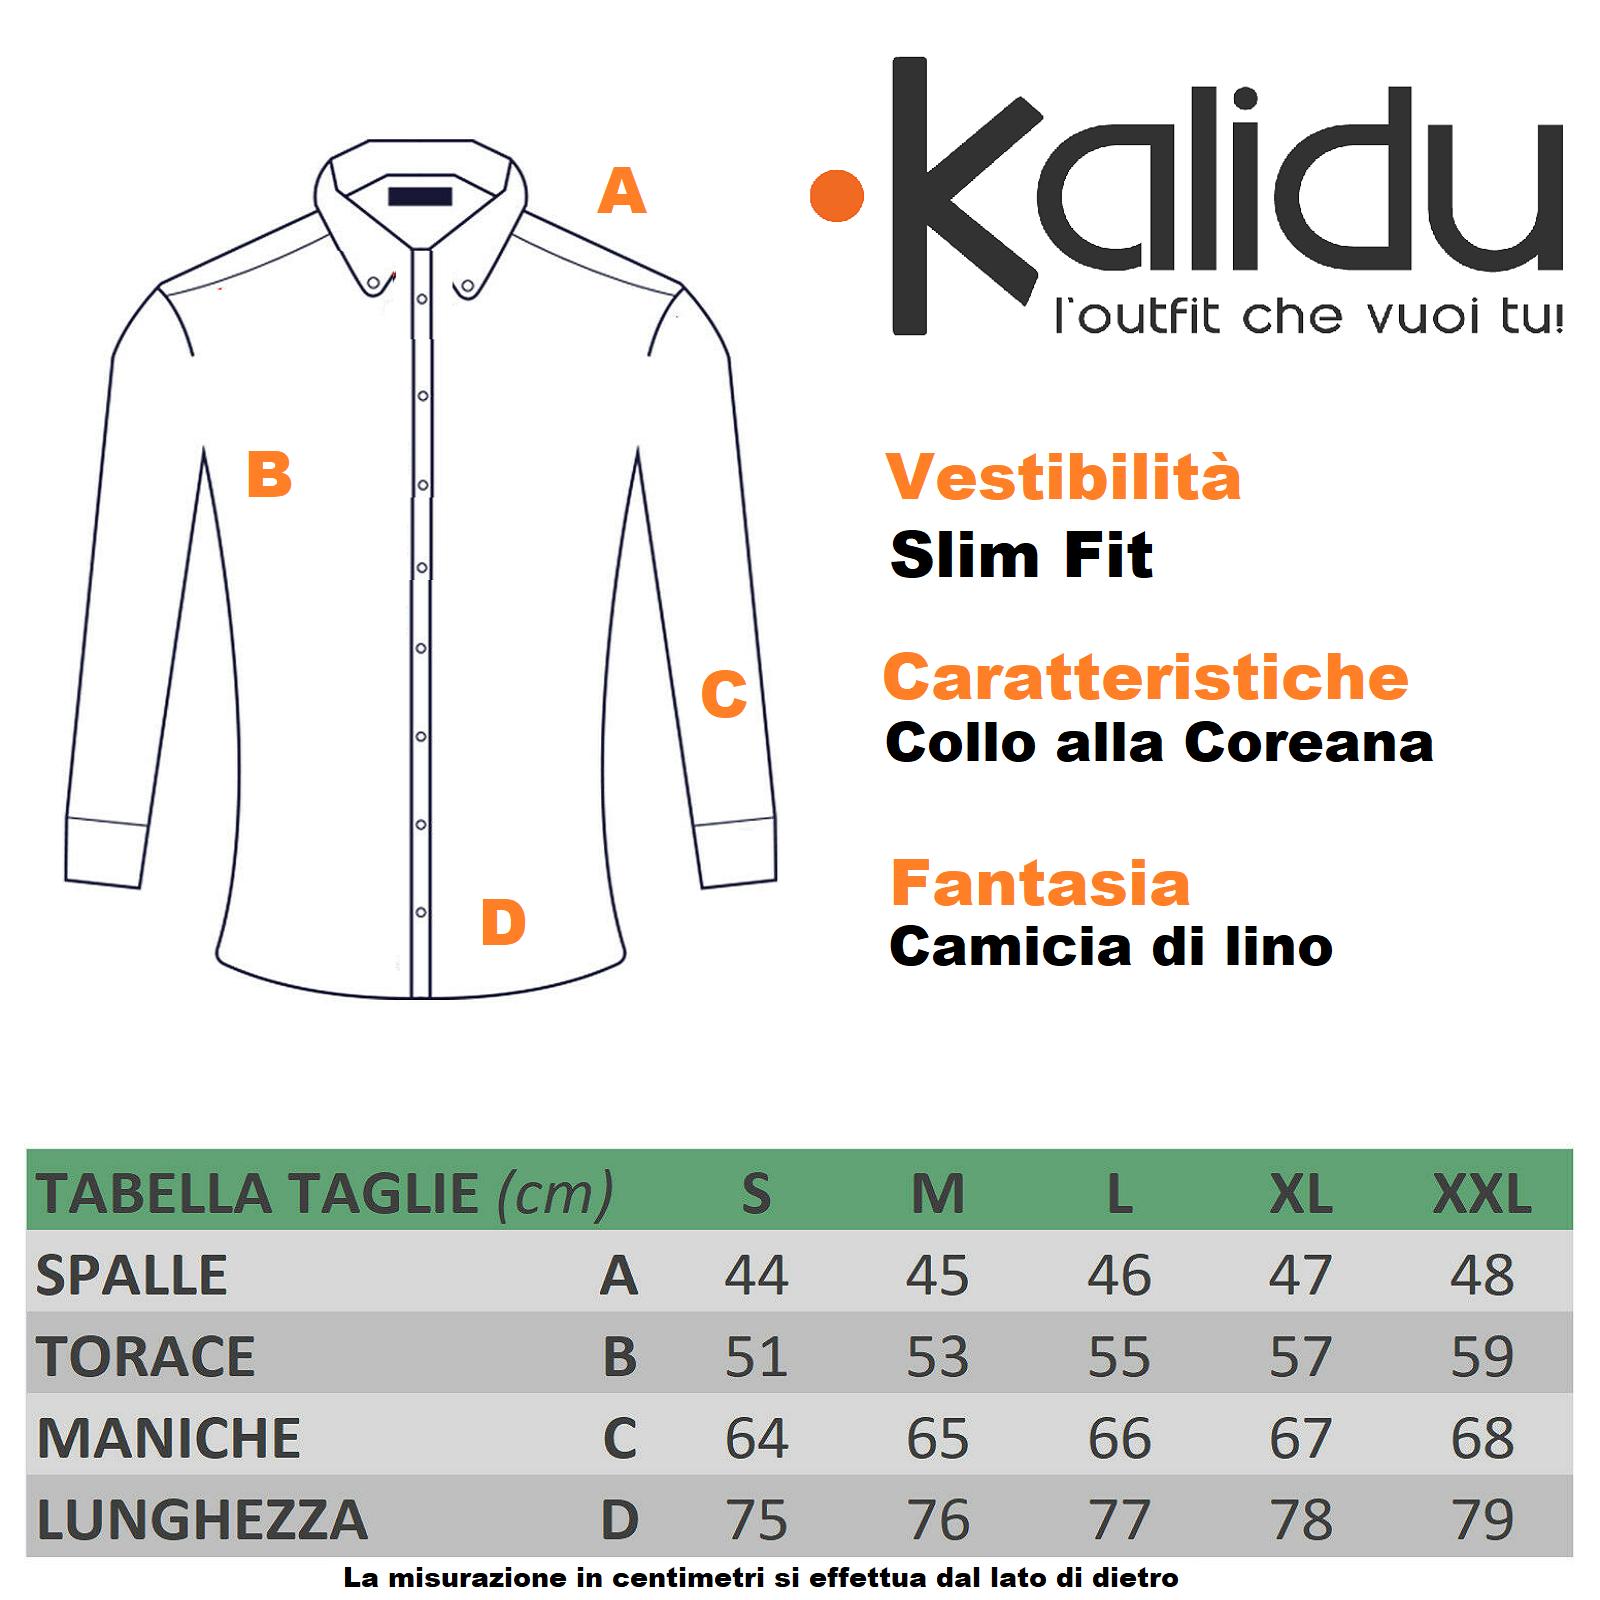 Camicia-Uomo-Lino-slim-fit-Coreana-Estiva-Bianca-Beige-Nera-Verde-CasualFresca-L miniatura 16